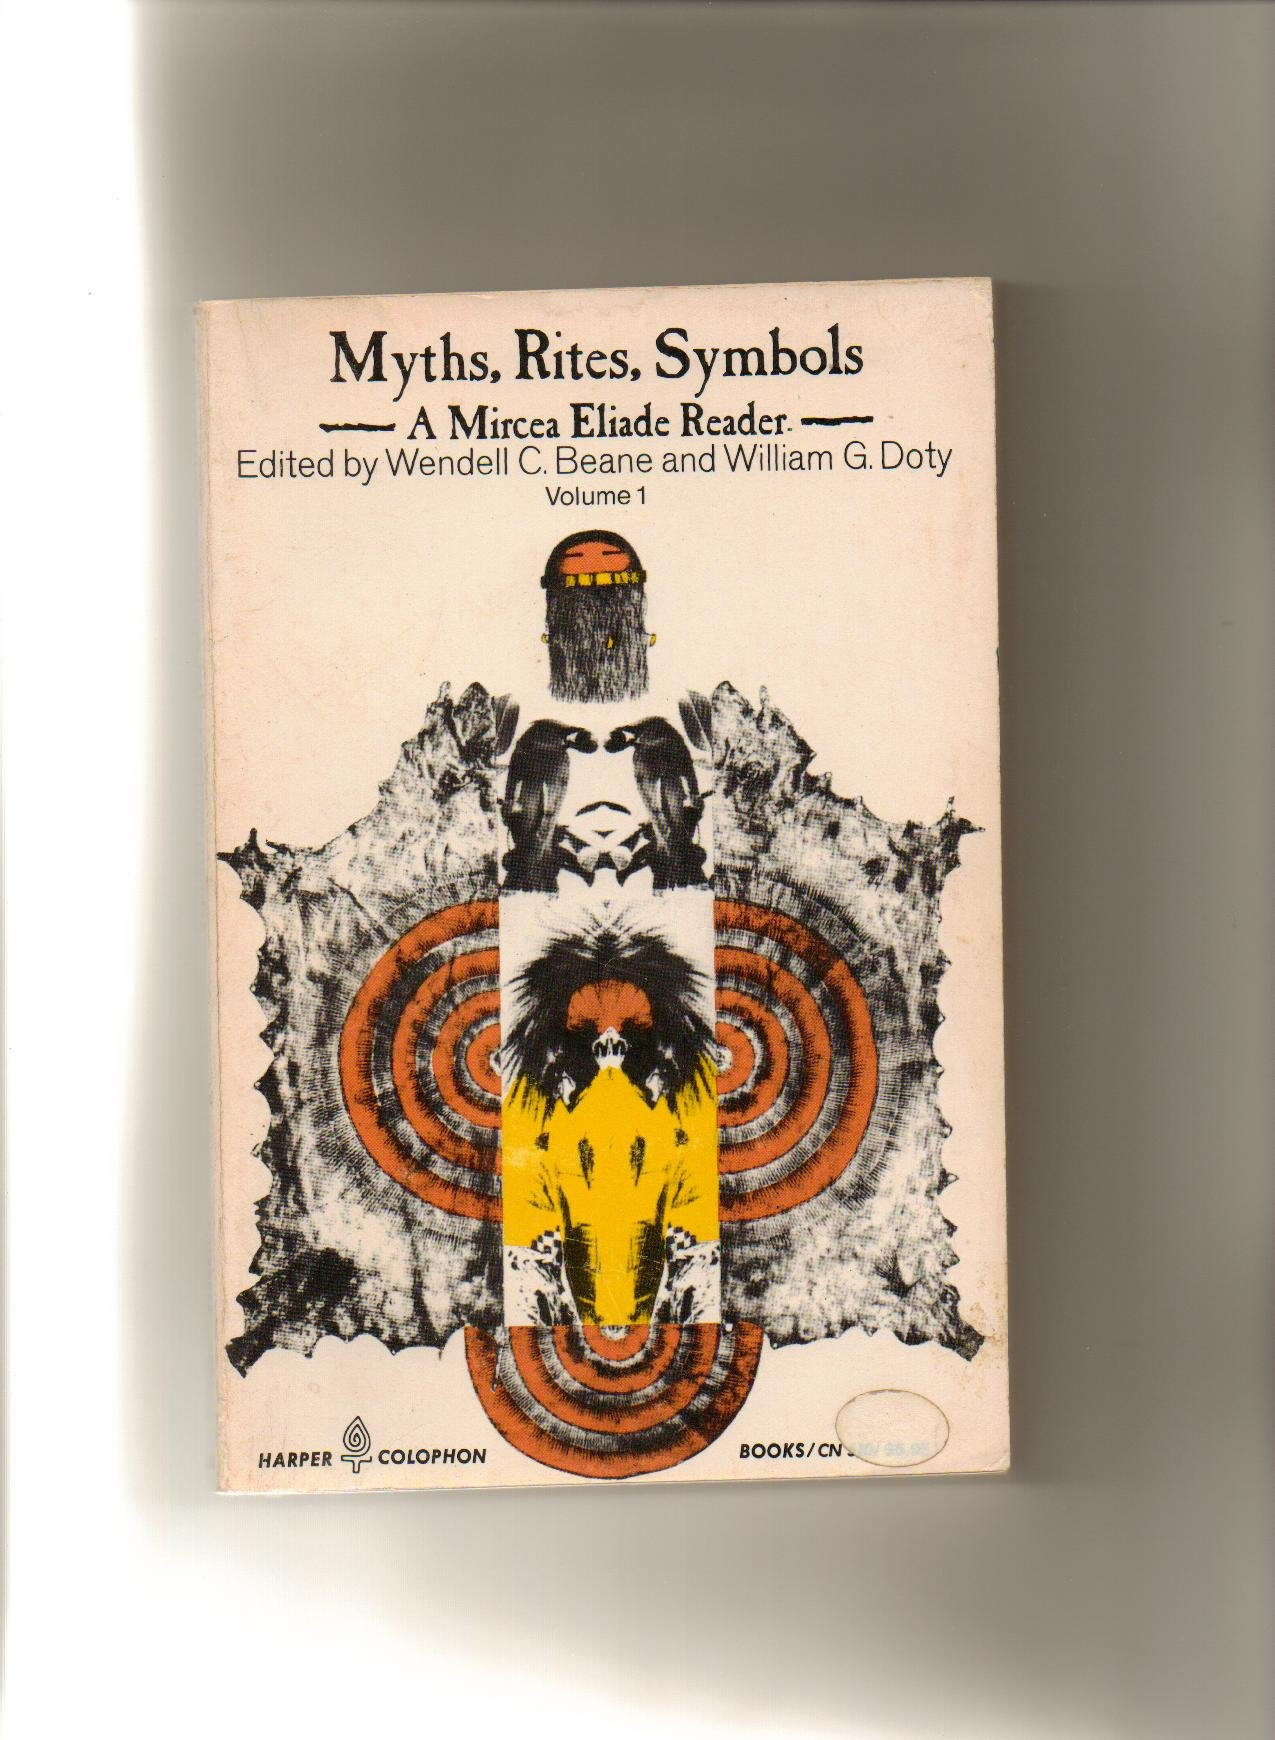 001 myths rites symbols a mircea eliade reader mircea eliade 001 myths rites symbols a mircea eliade reader mircea eliade 9780061319556 amazon books buycottarizona